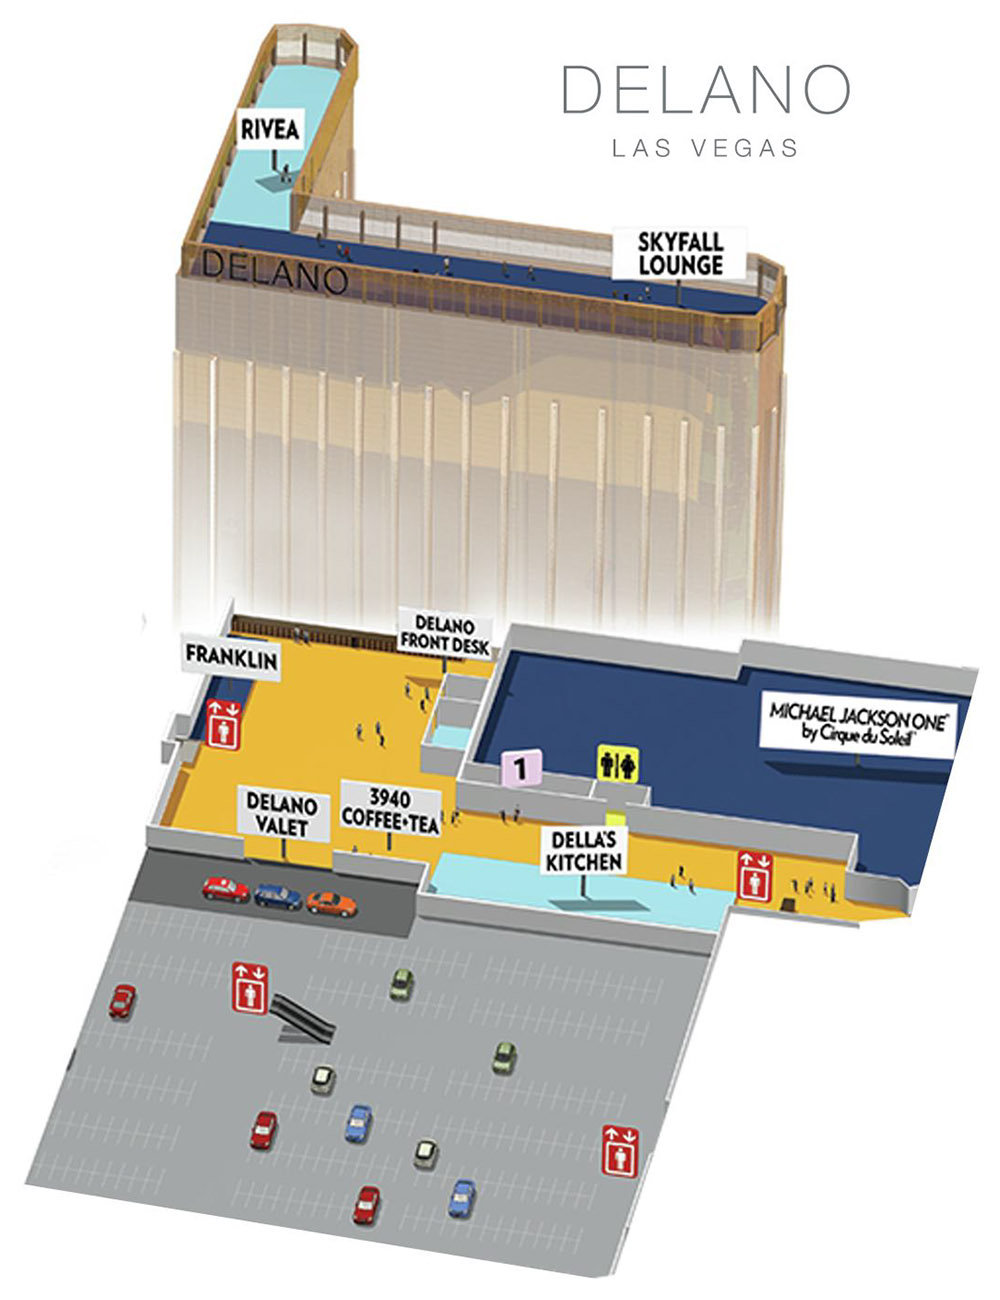 Delano Casino Property Map & Floor Plans - Las Vegas